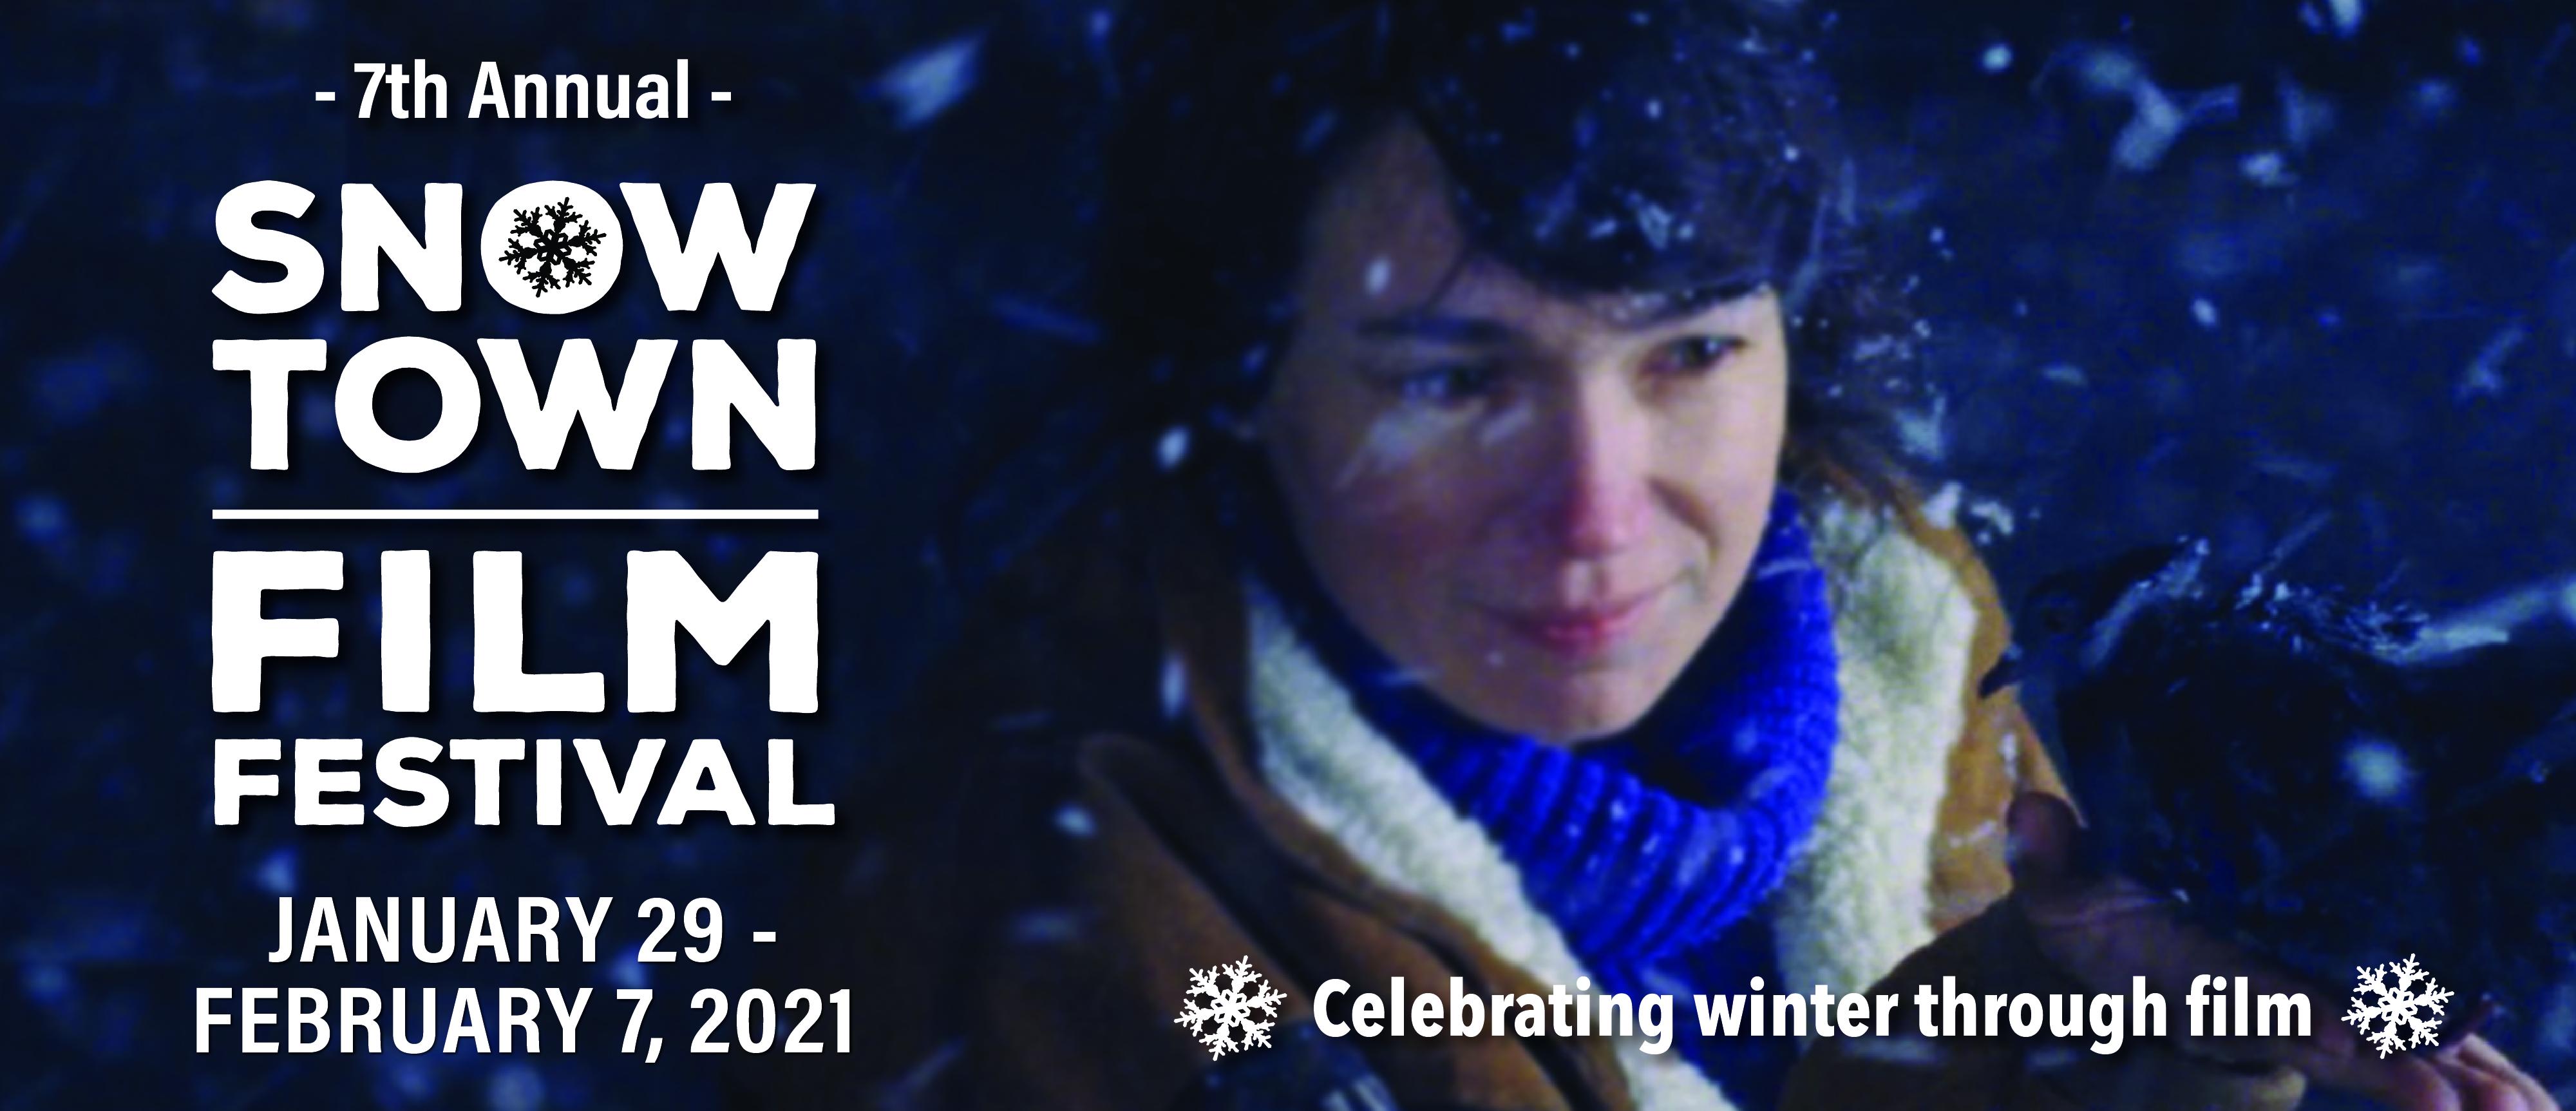 Snowtown Film Festival